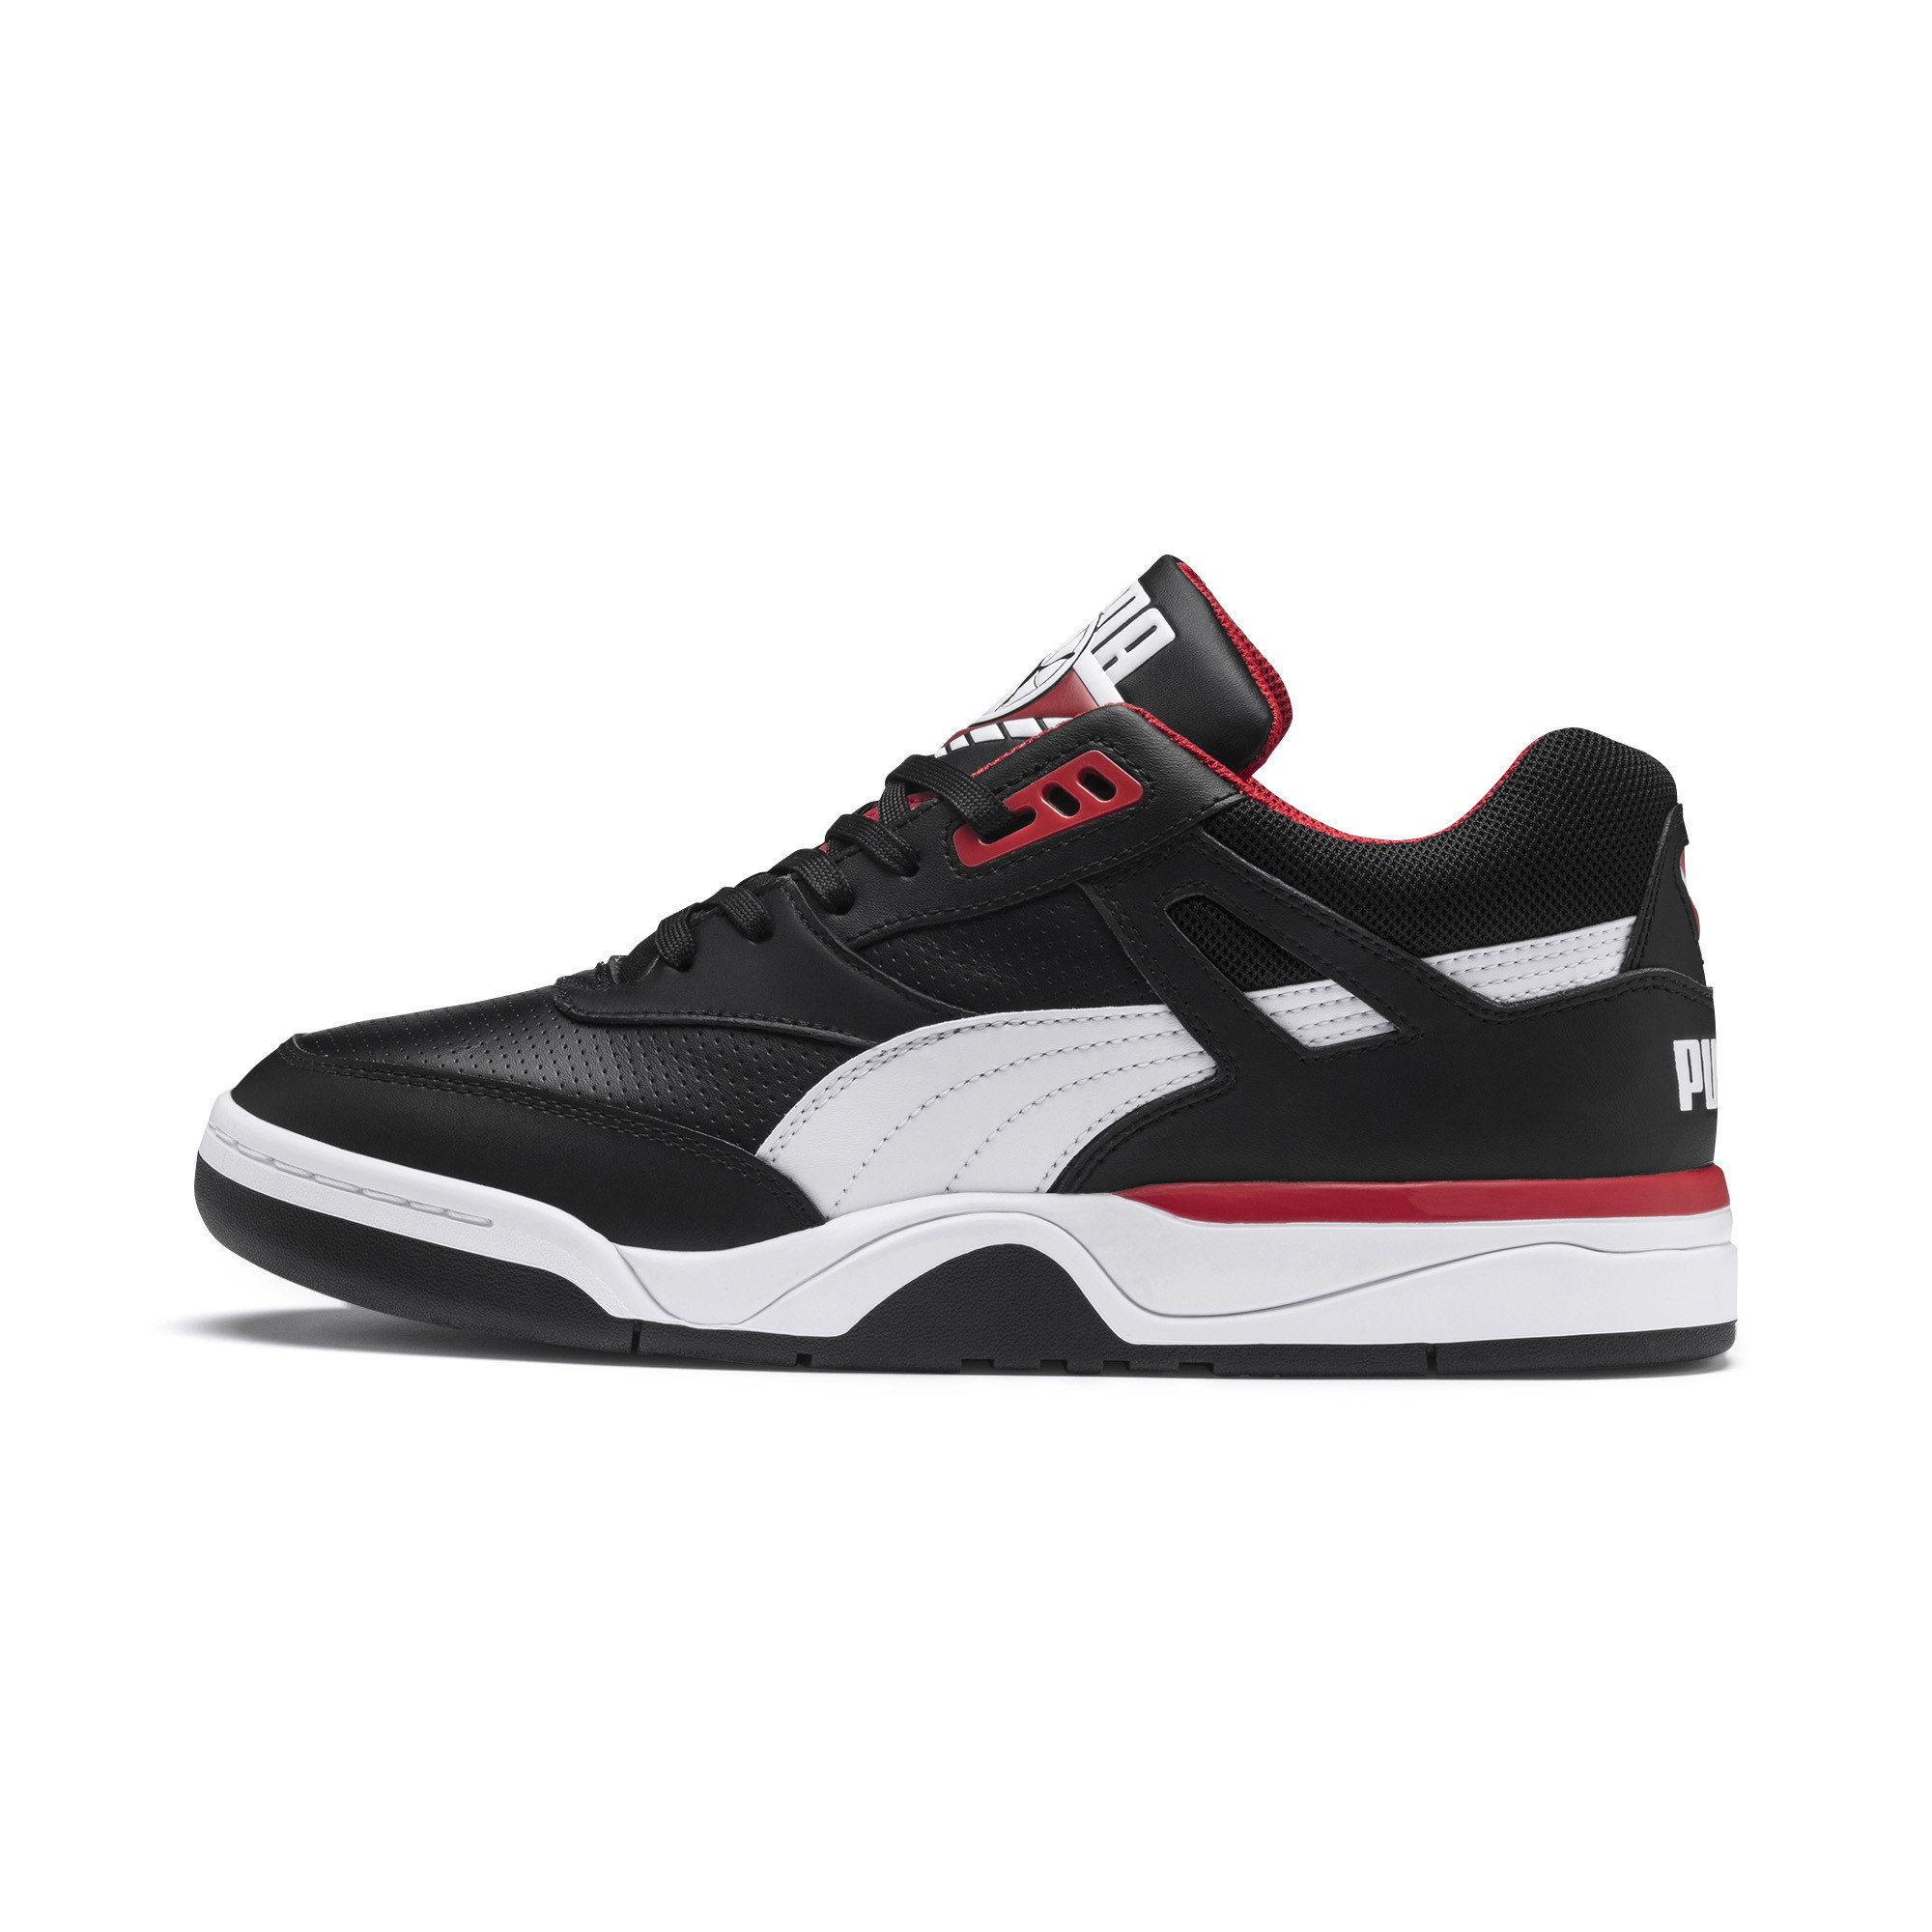 Indexbild 10 - PUMA Palace Guard Sneaker Unisex Schuhe Sport Classics Neu